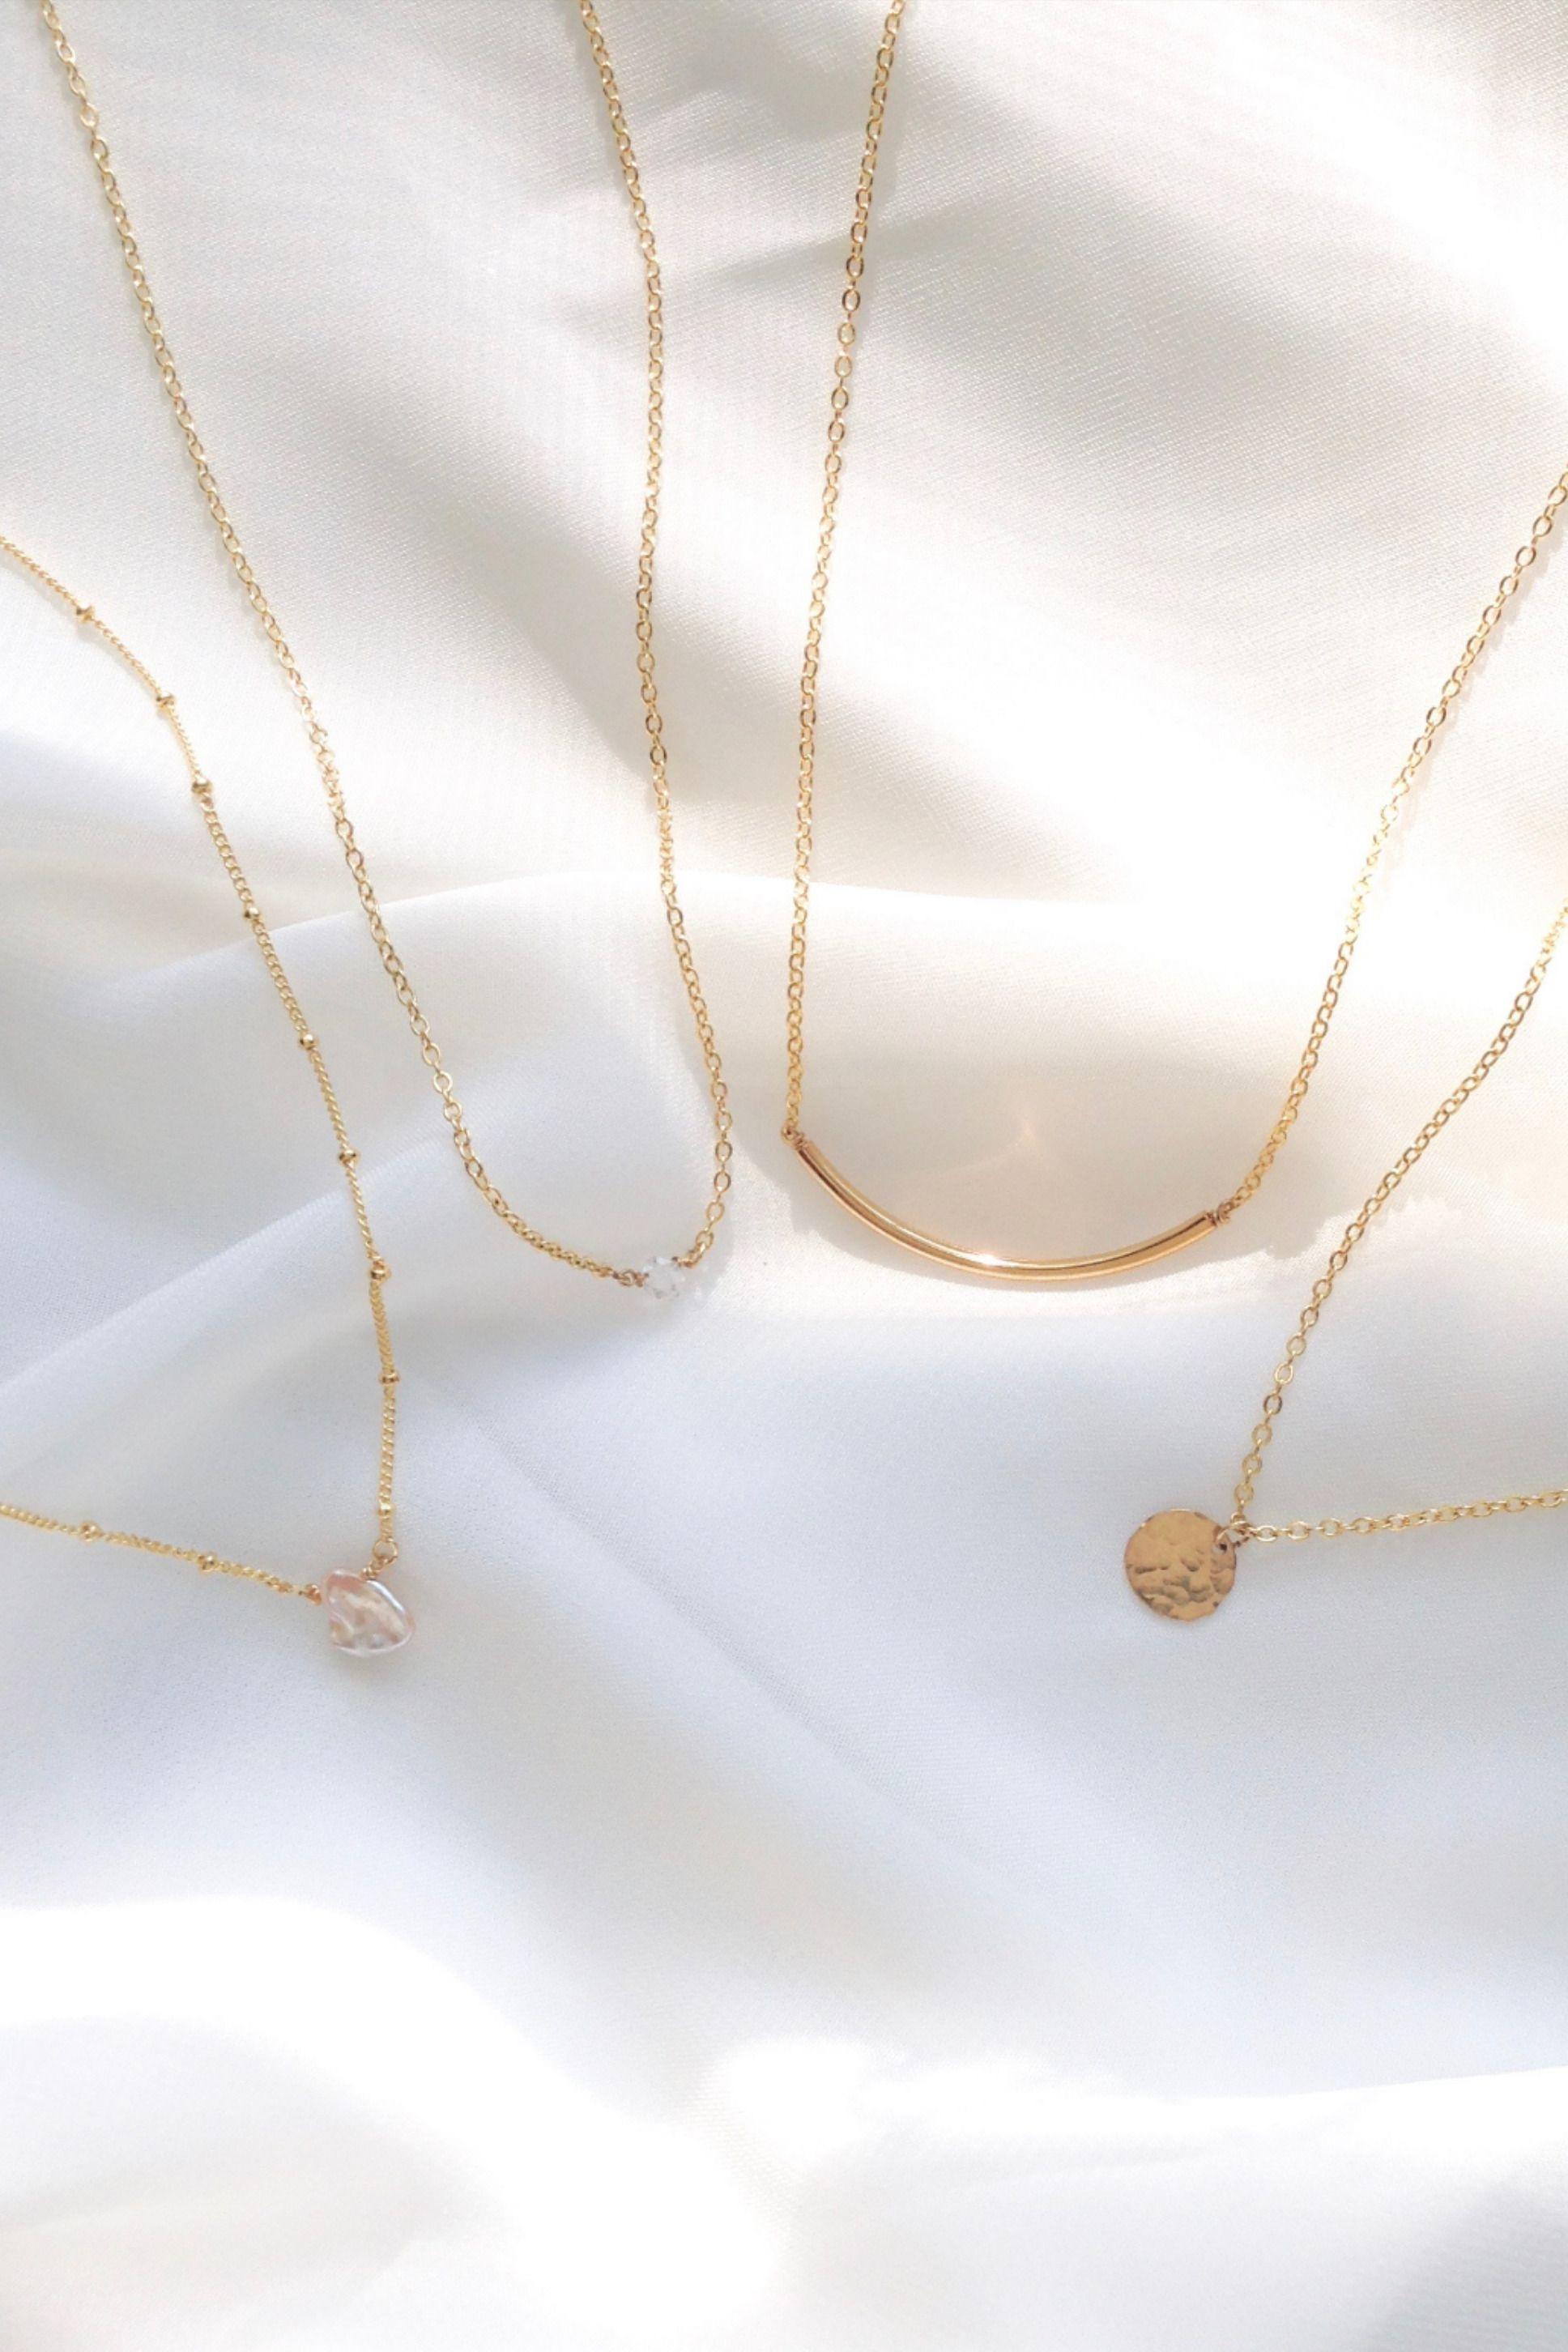 Photo of Simple everyday jewelry | IB jewelry